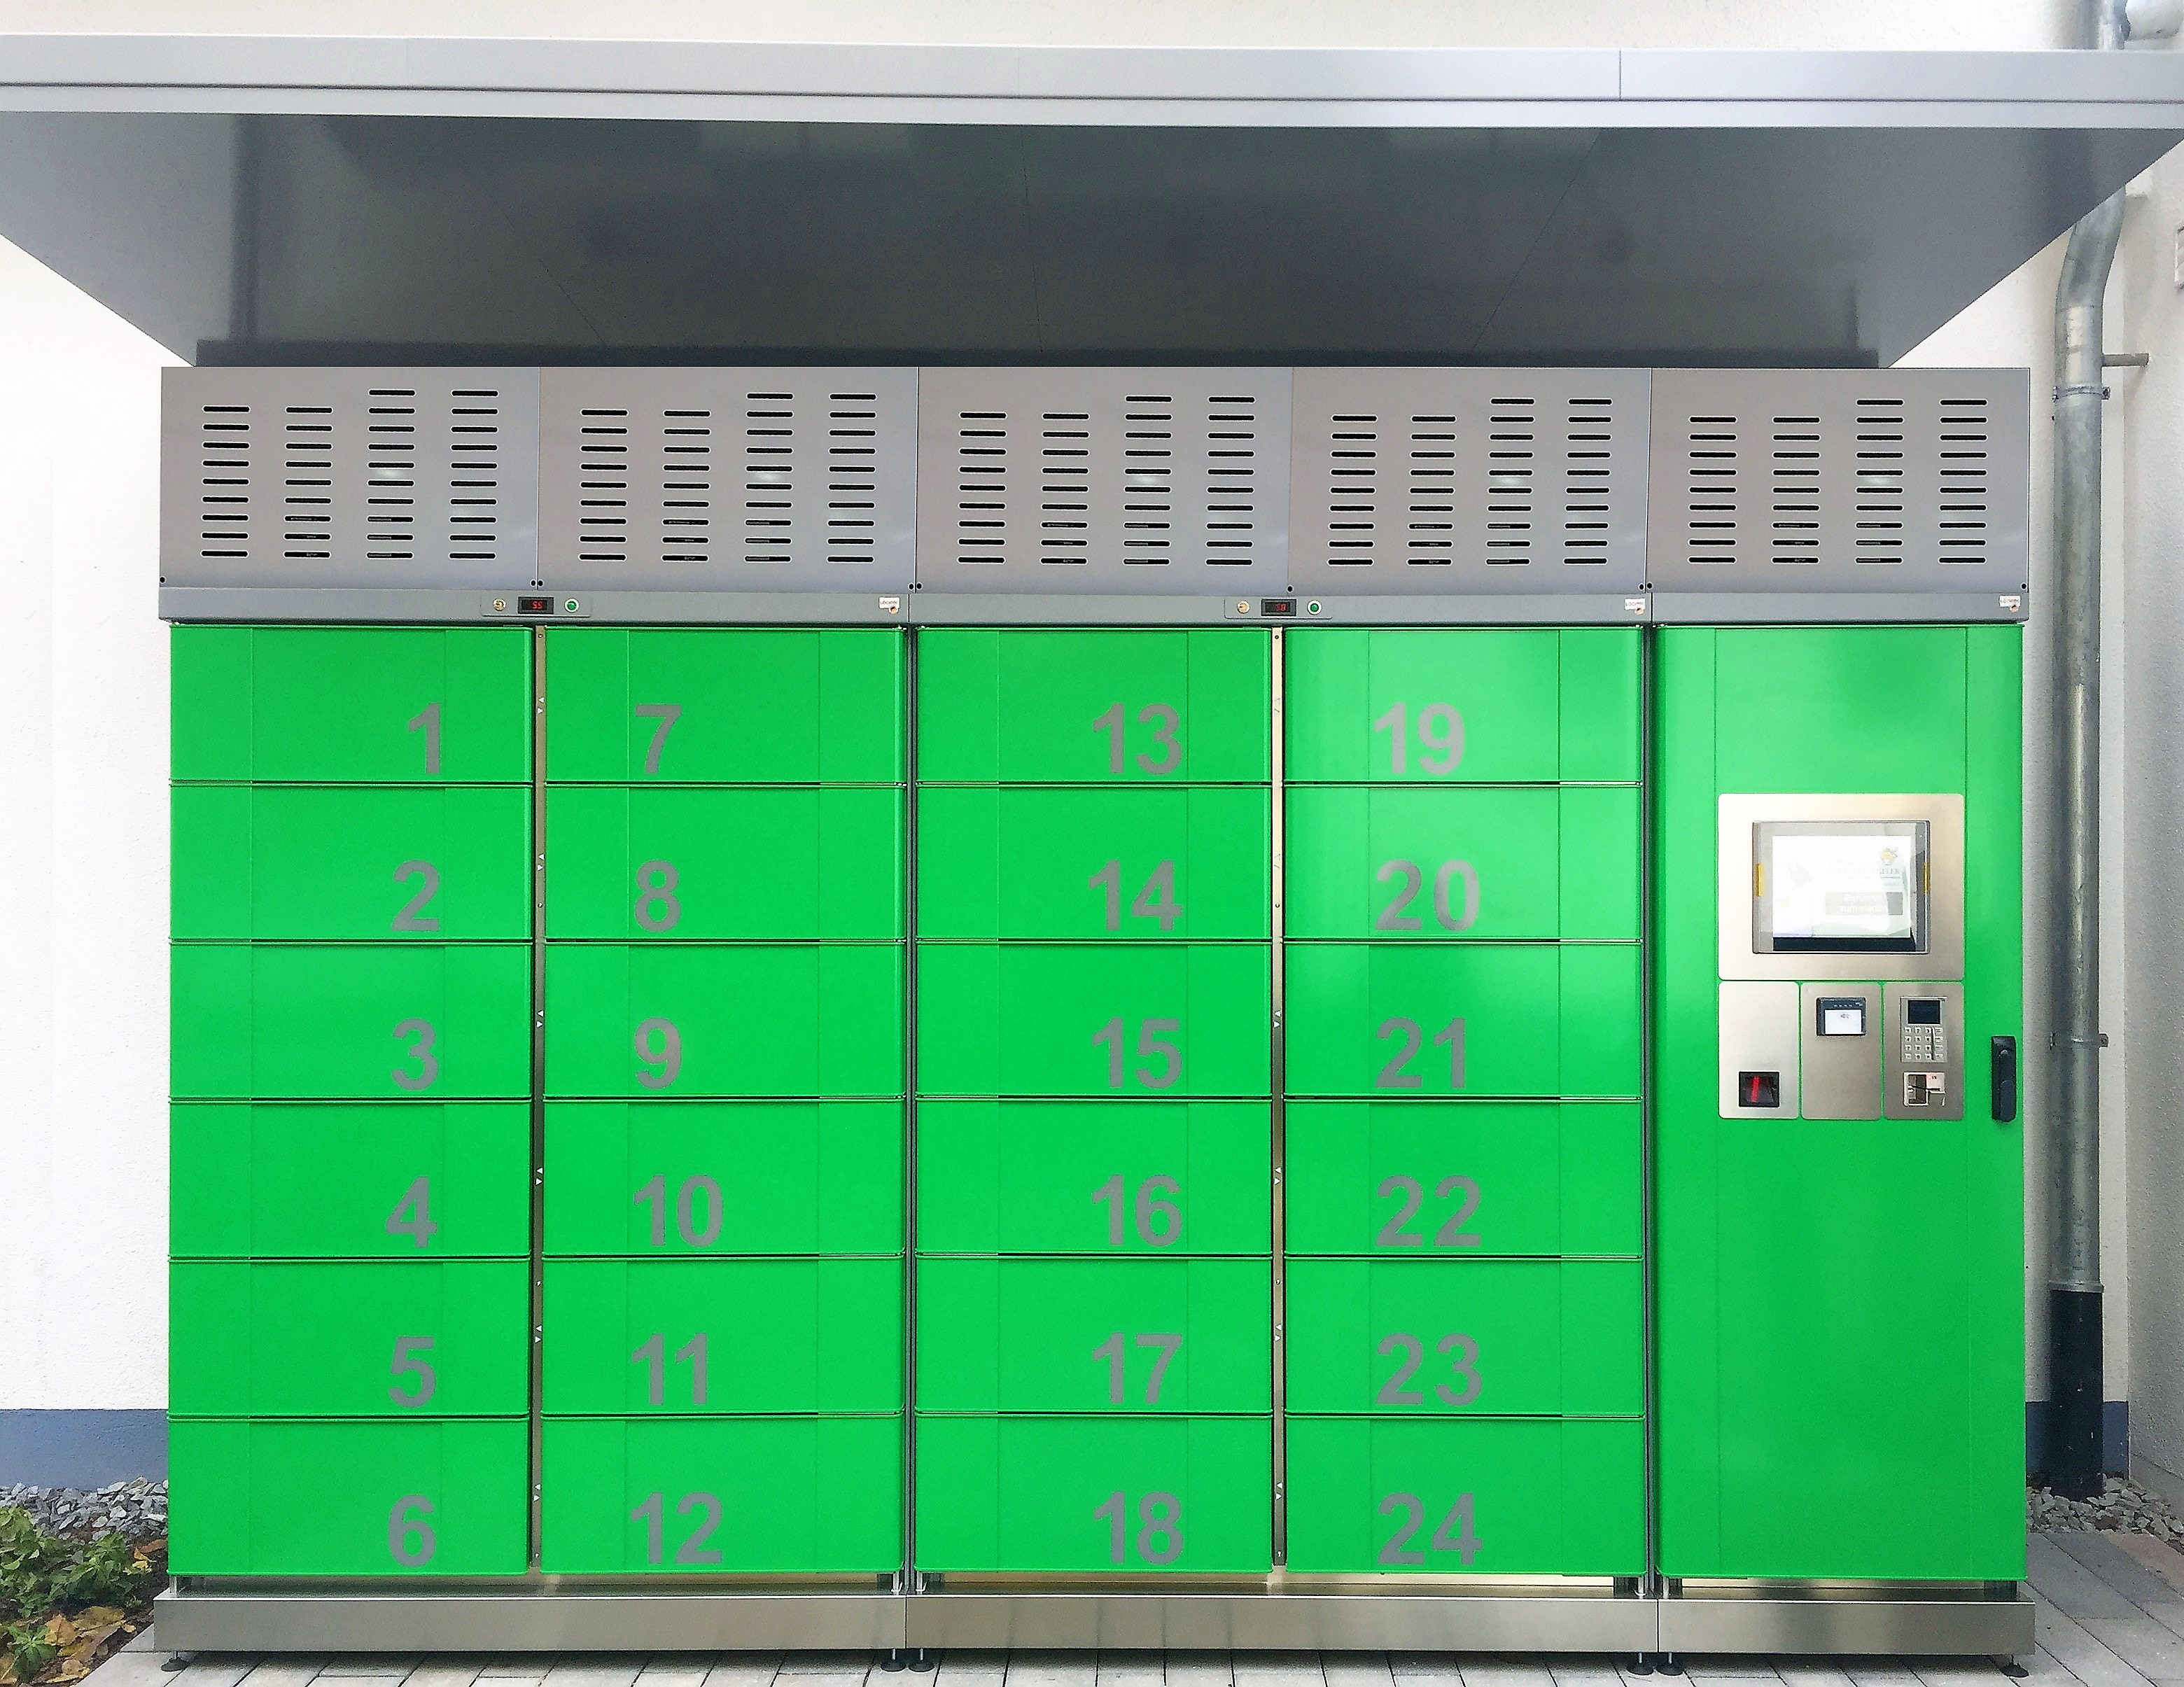 Gekühlte Abholstation cool lockers